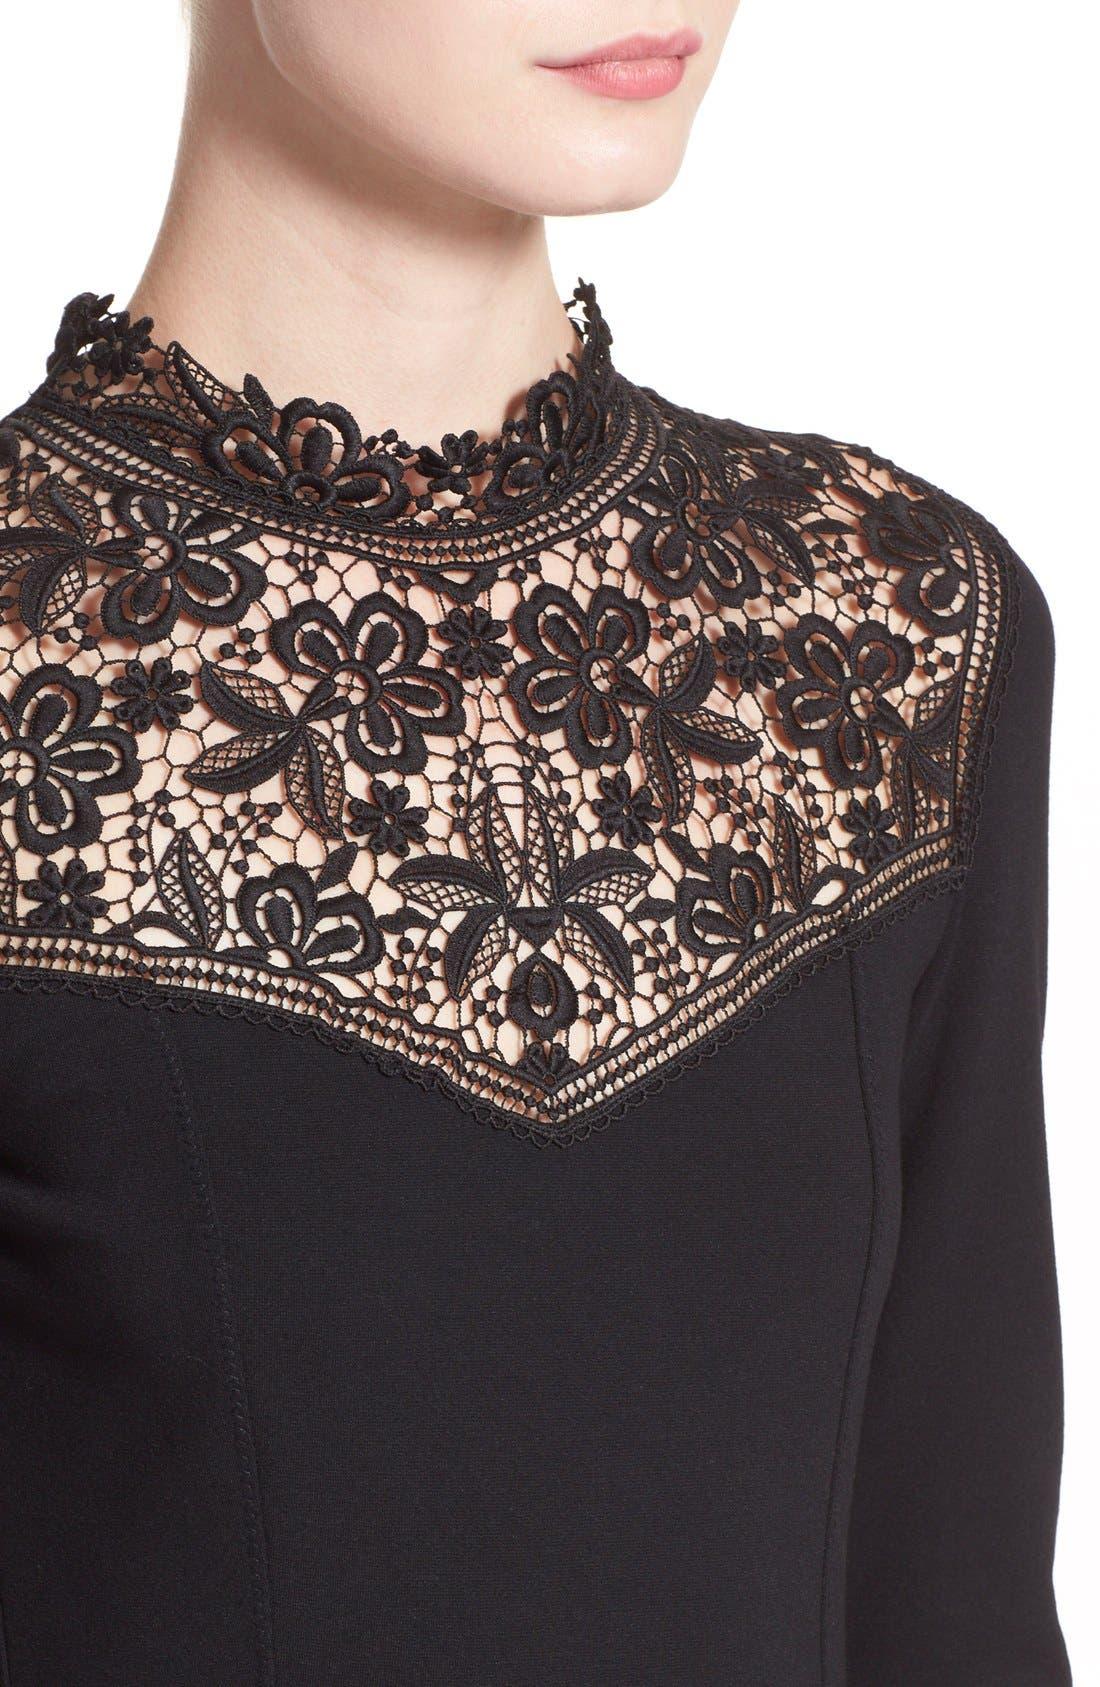 'Rieko' Lace Inset Jersey Dress,                             Alternate thumbnail 3, color,                             001